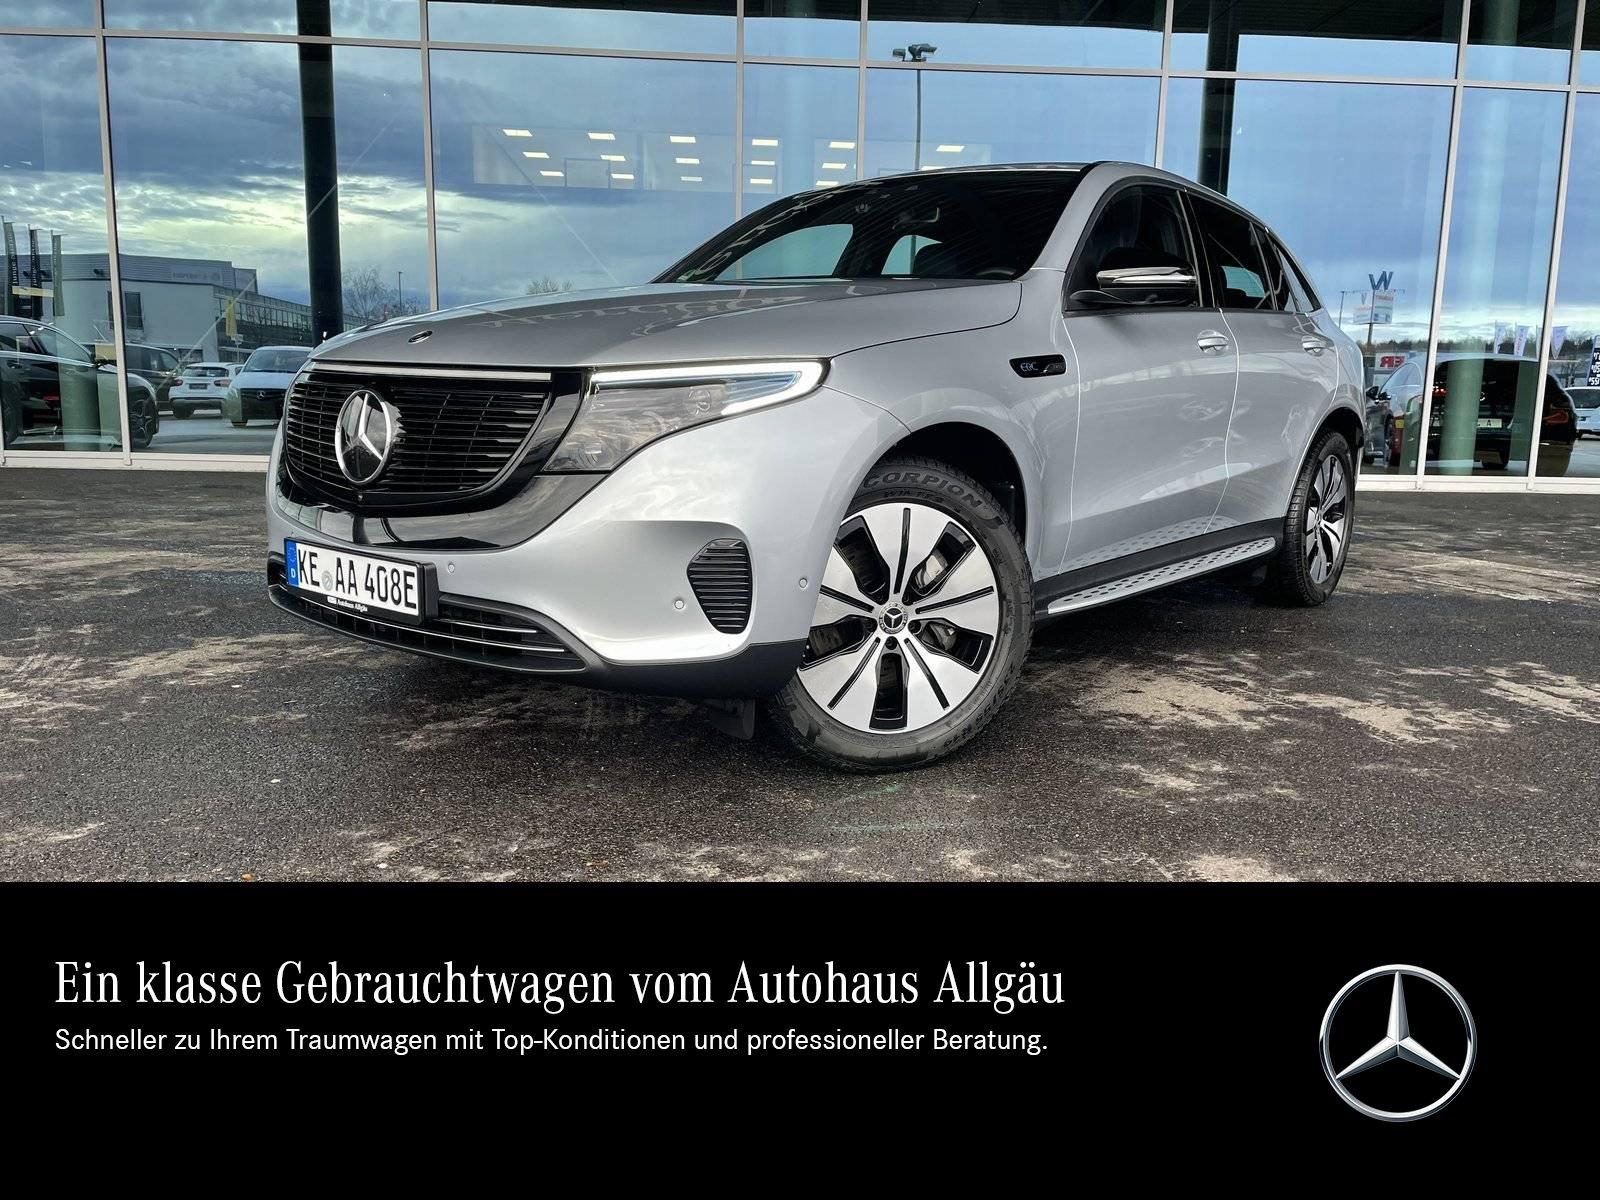 Mercedes-Benz EQC 400 4M+MULTI-LED+BURMESTER+KAMERA+LEDER+SITZ, Jahr 2019, Elektro